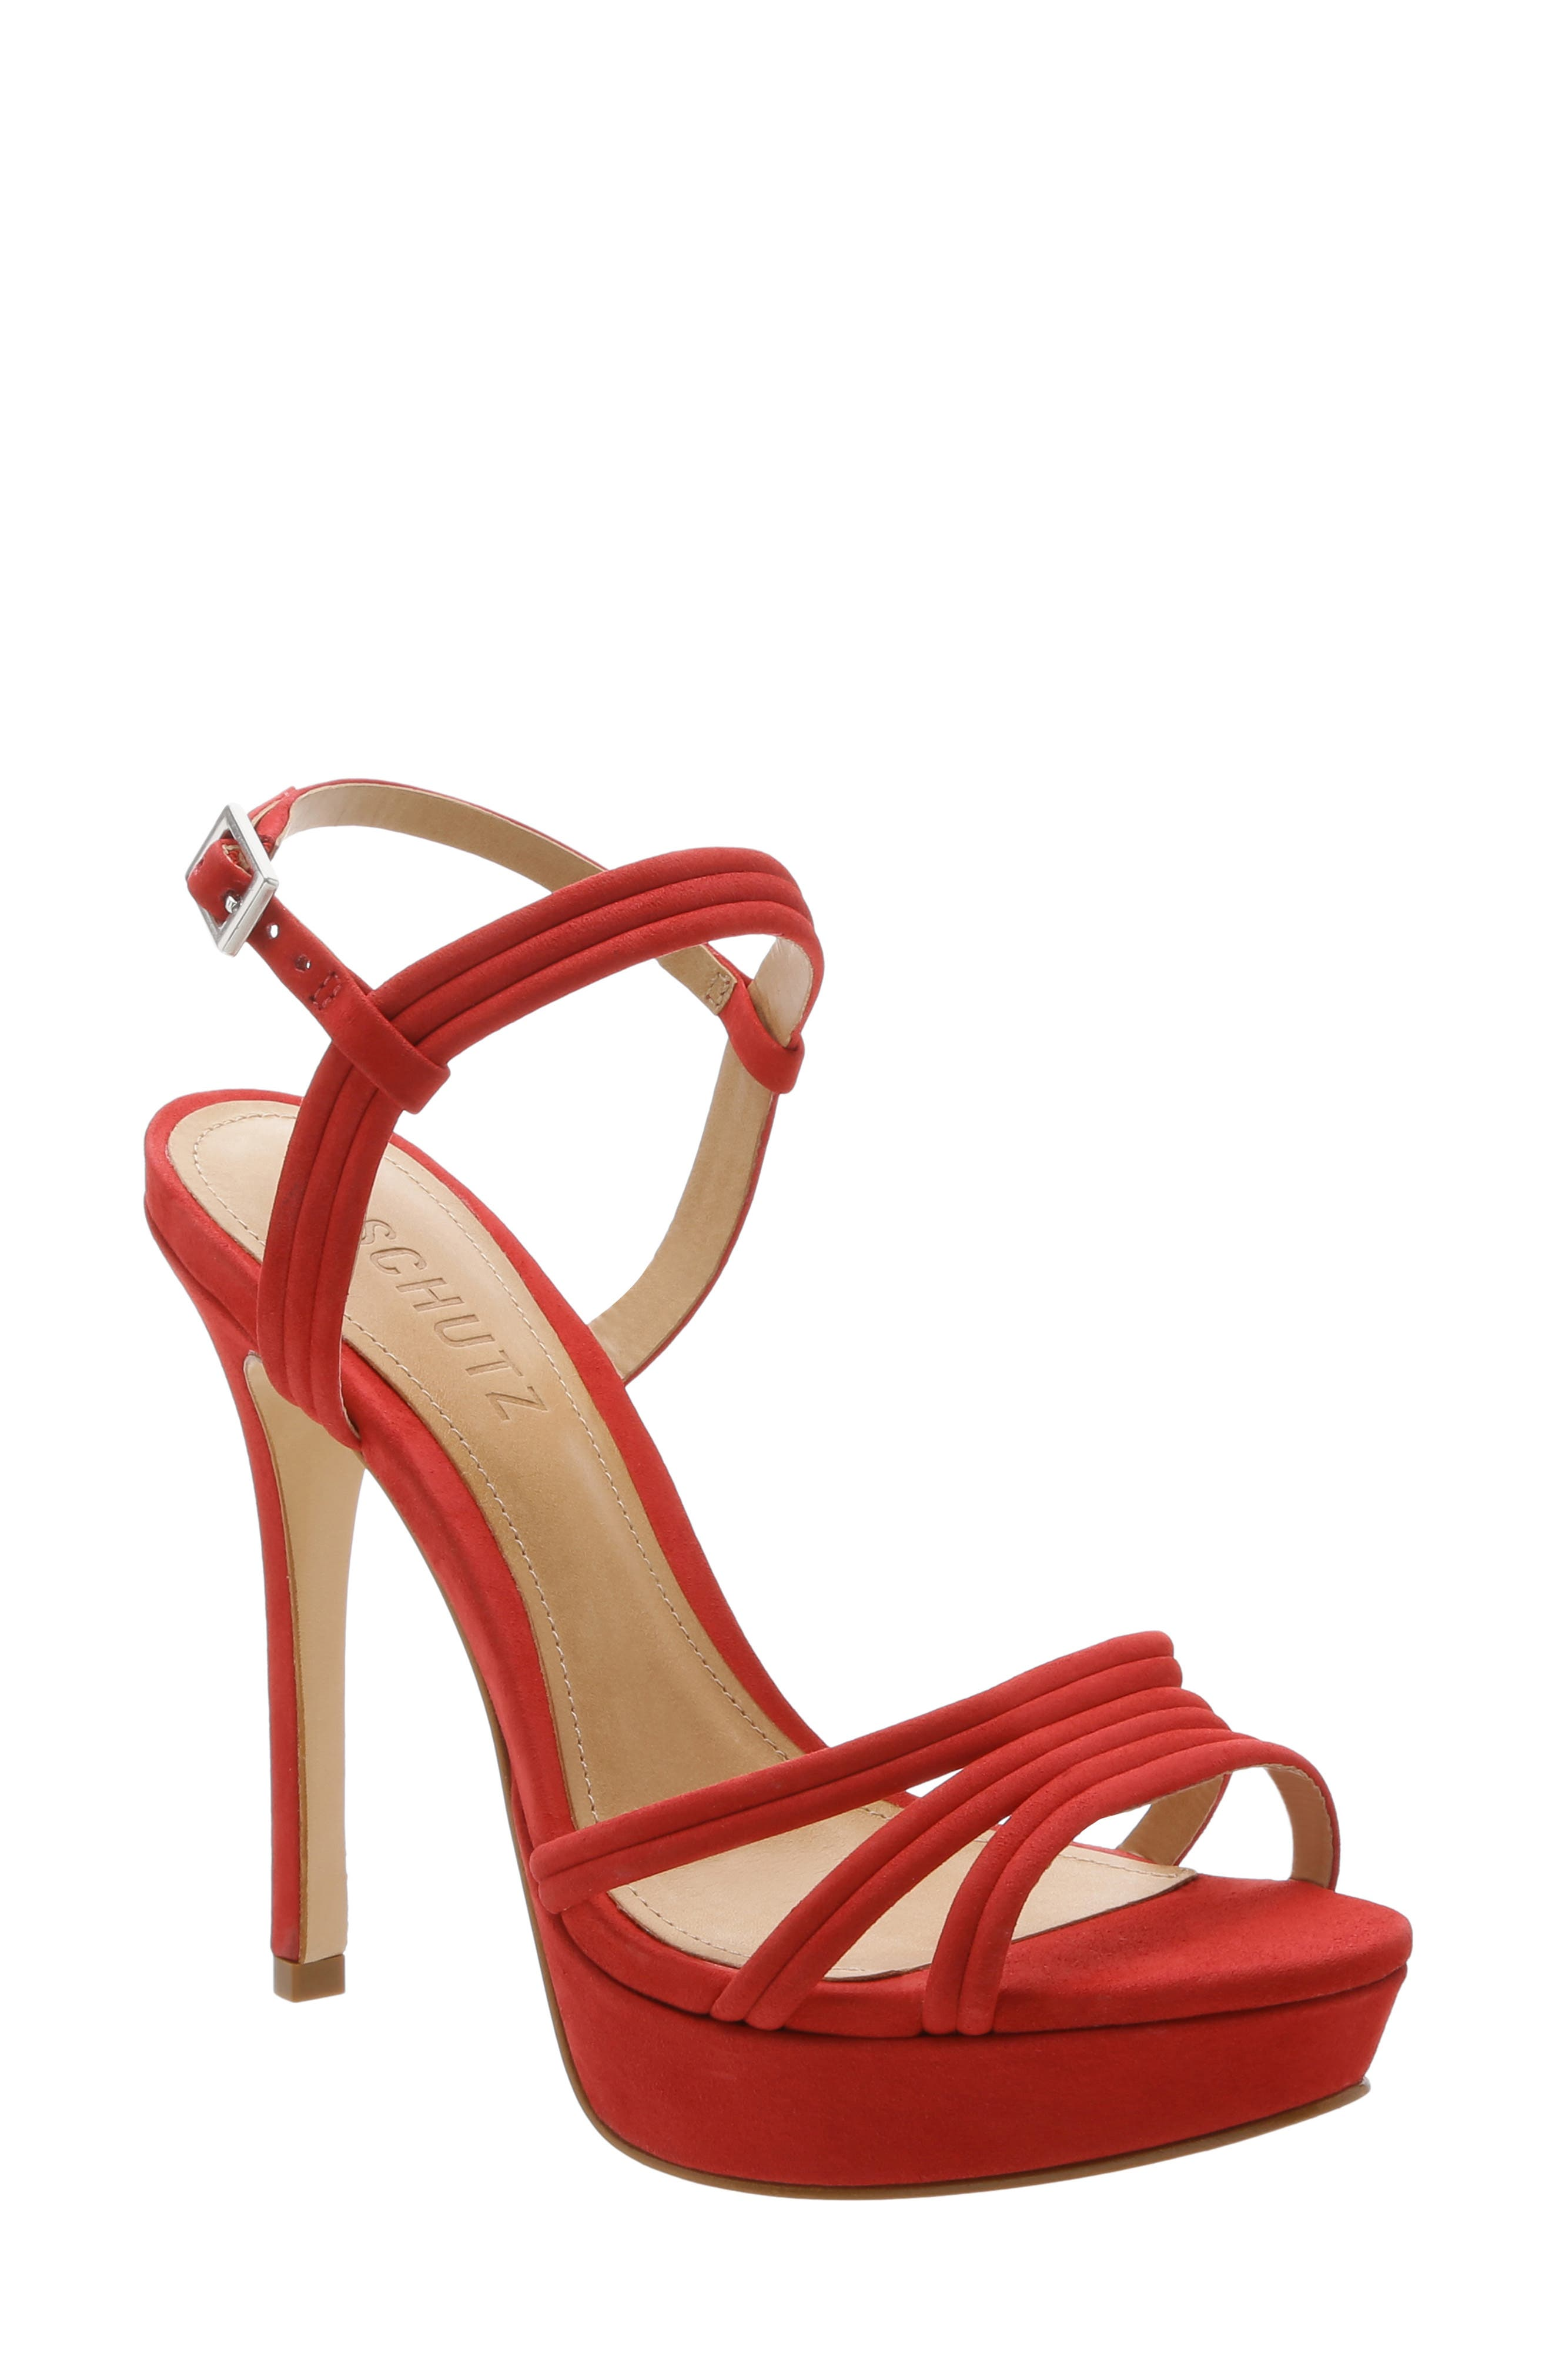 Schutz Bogga Platform Sandal, Red